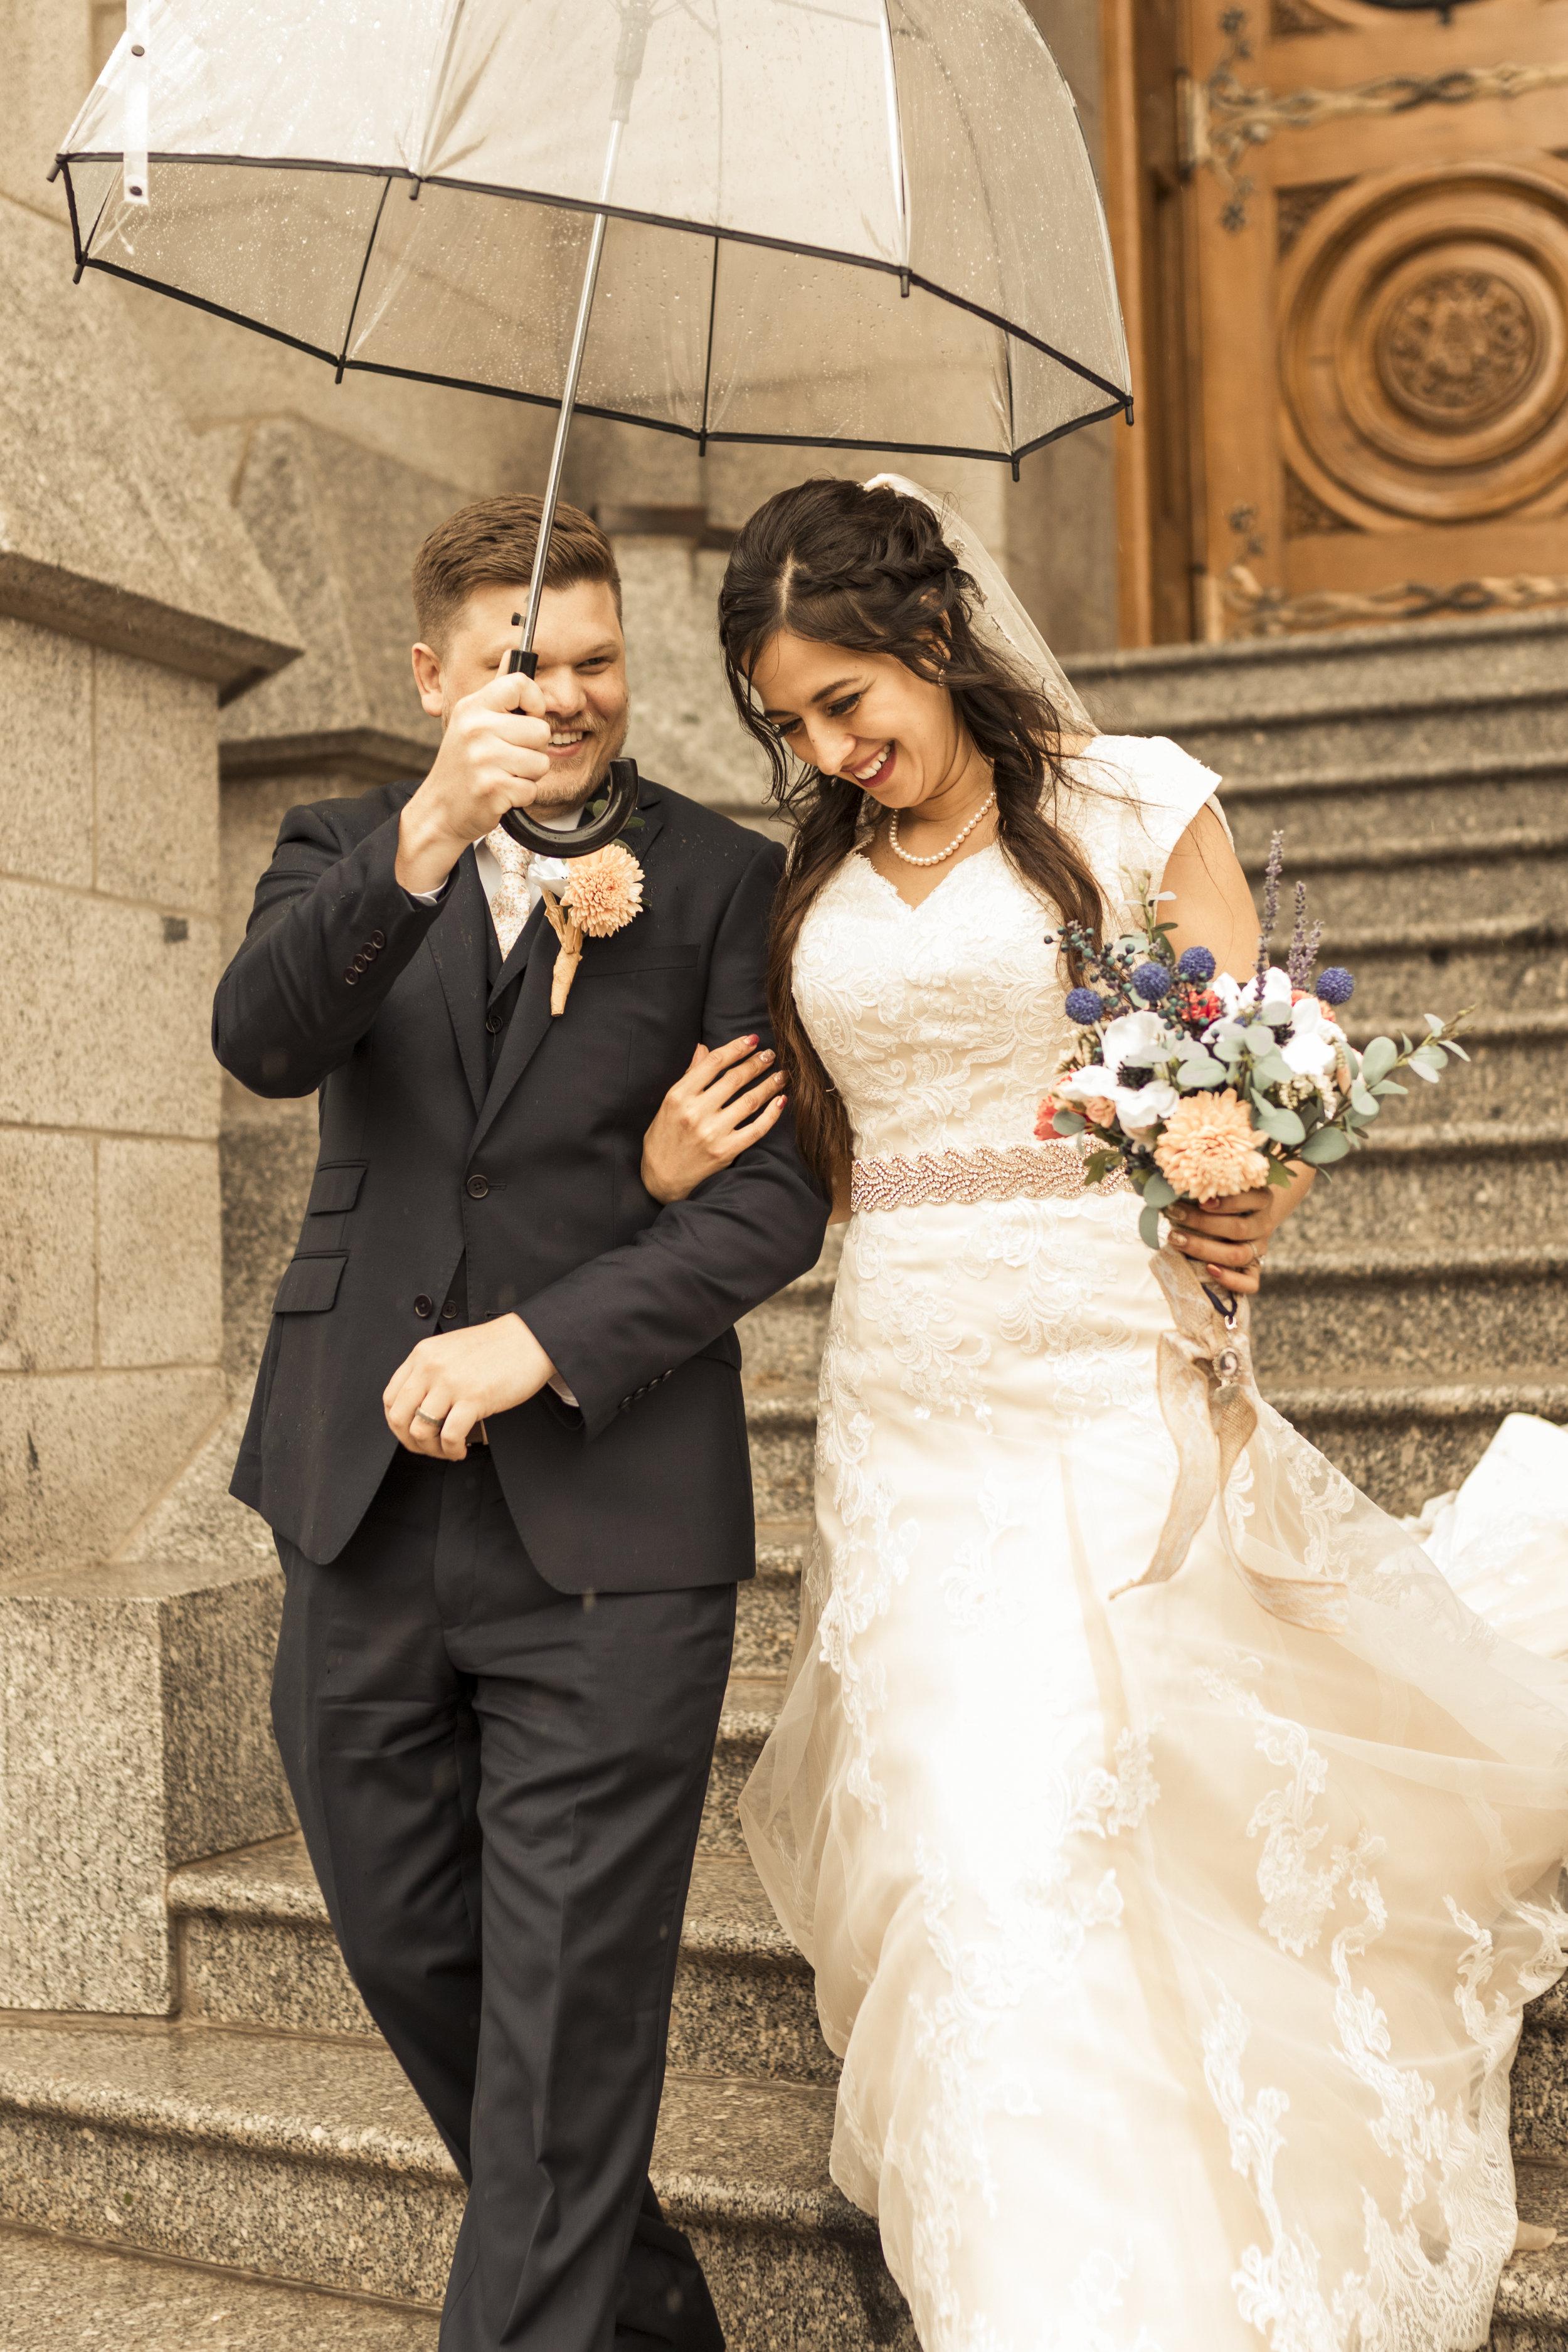 Rainy Spring Wedding at the Salt Lake Templeby Bri Bergman Photography02.JPG